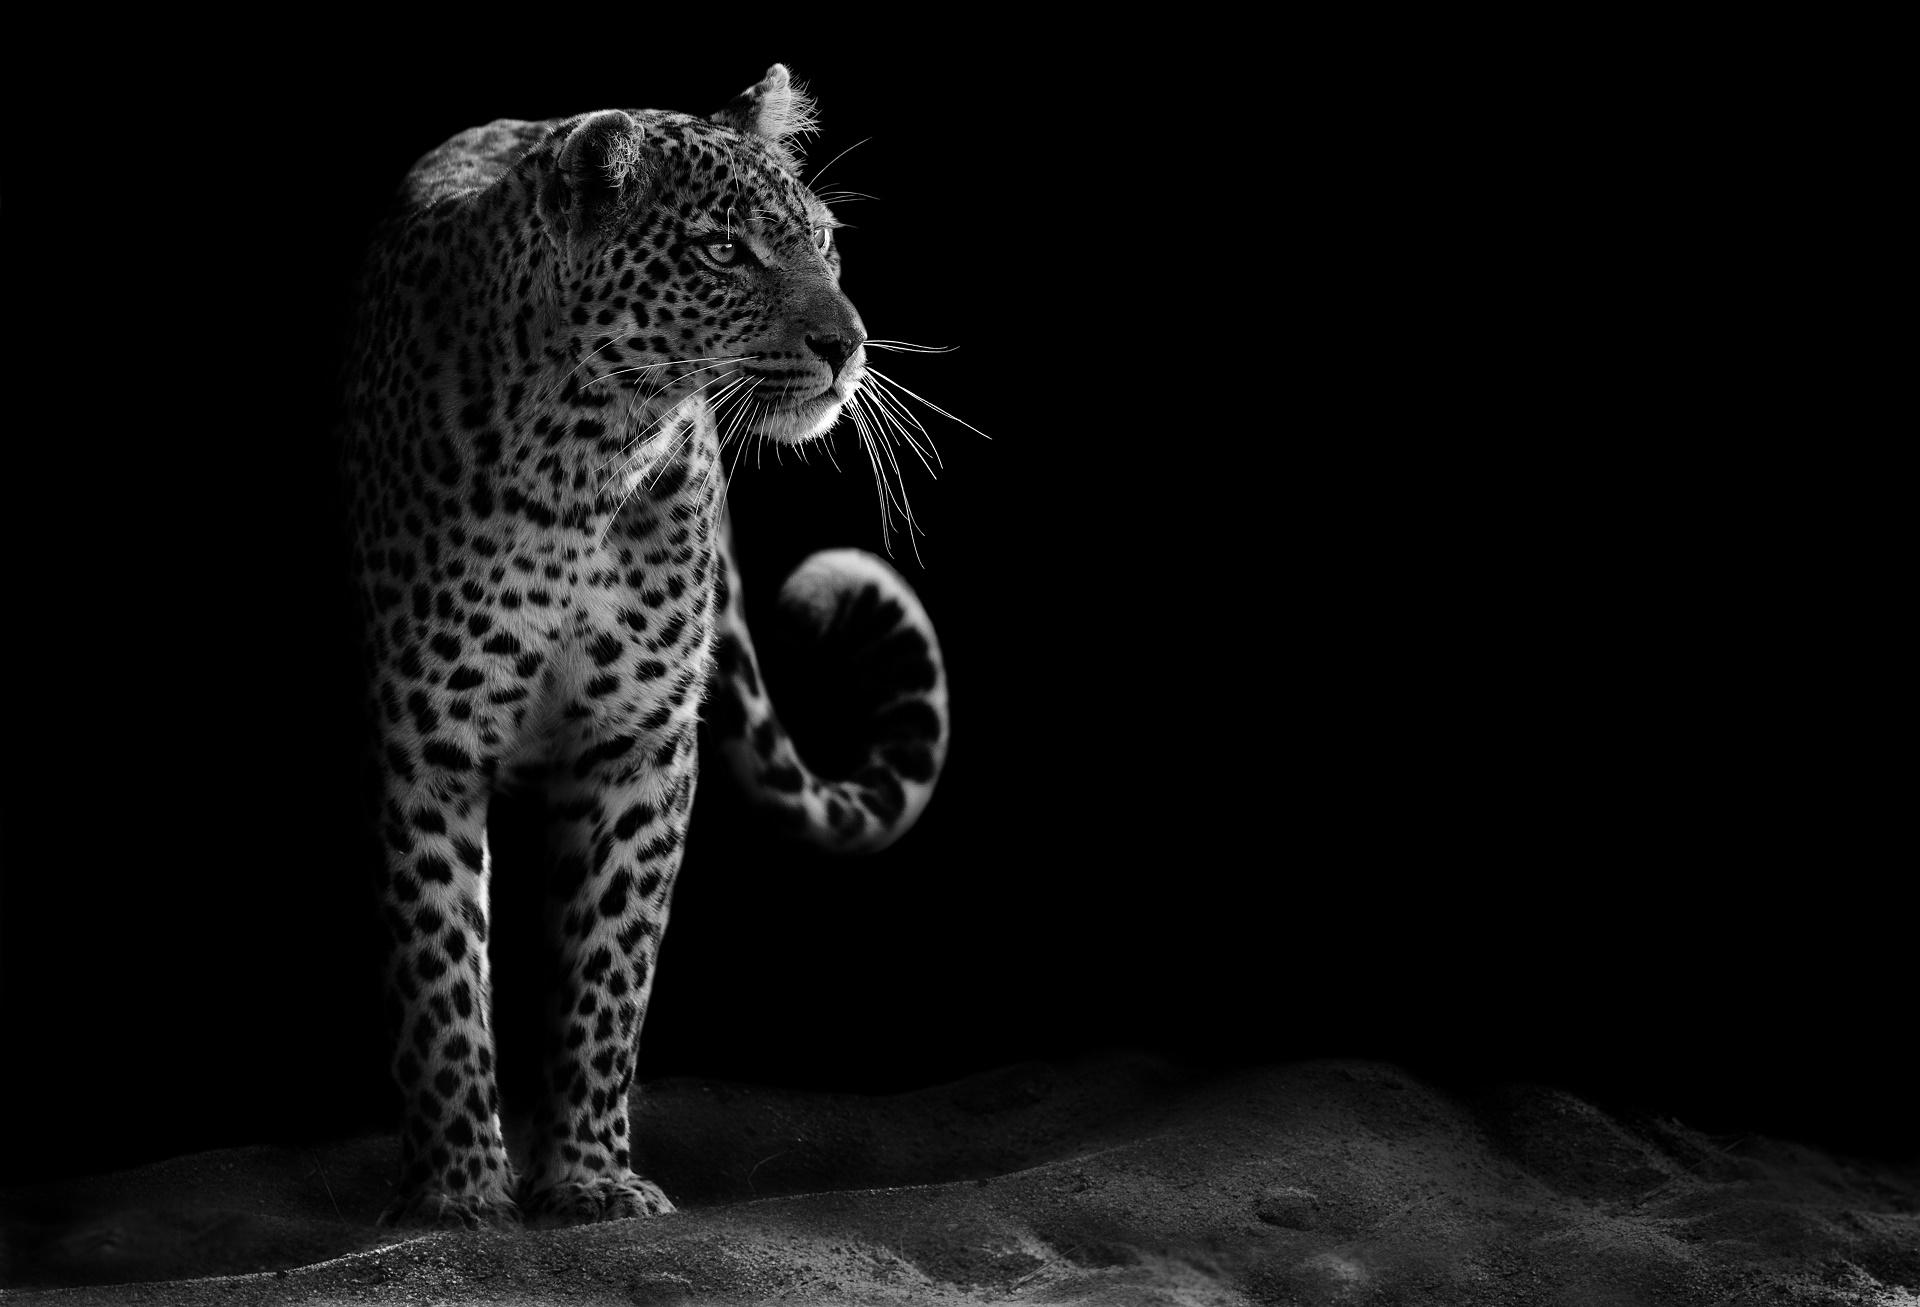 Leopard 4k Black Background Hd Animals 4k Wallpapers: Arrière-plans - Wallpaper Abyss